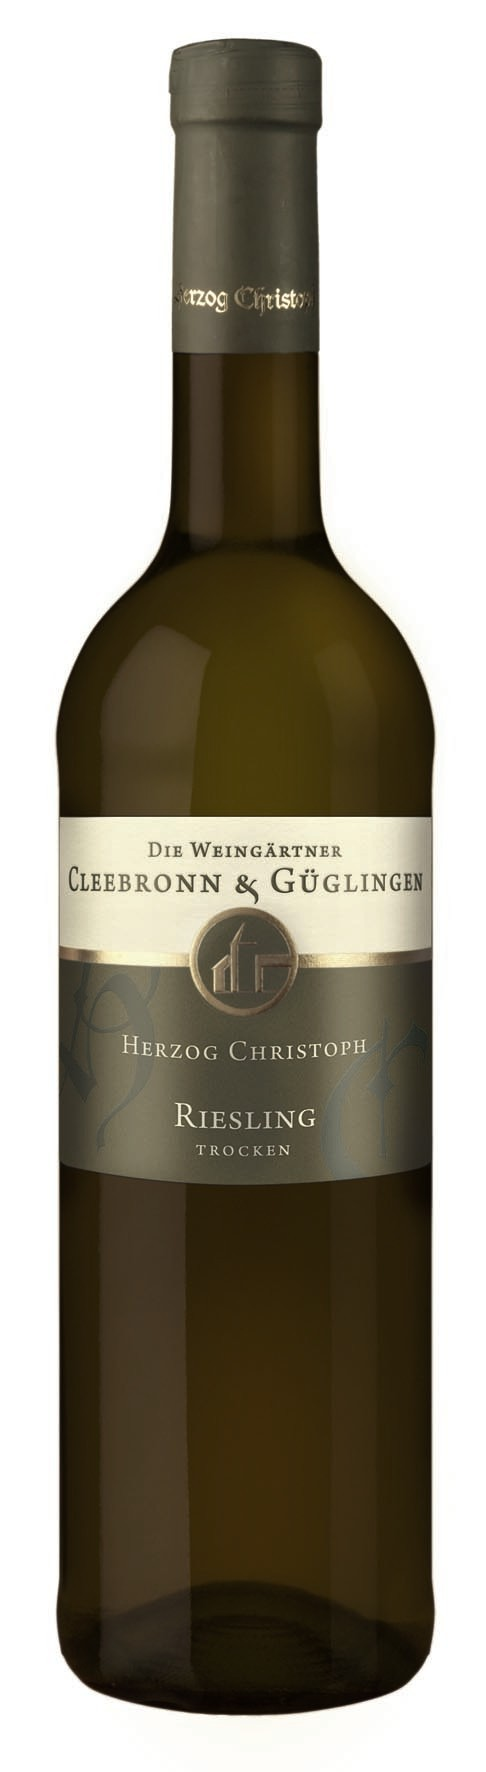 Riesling Herzog Chr. QbA tr. 2010 WG Cleebronn-Güglingen 0,75l.